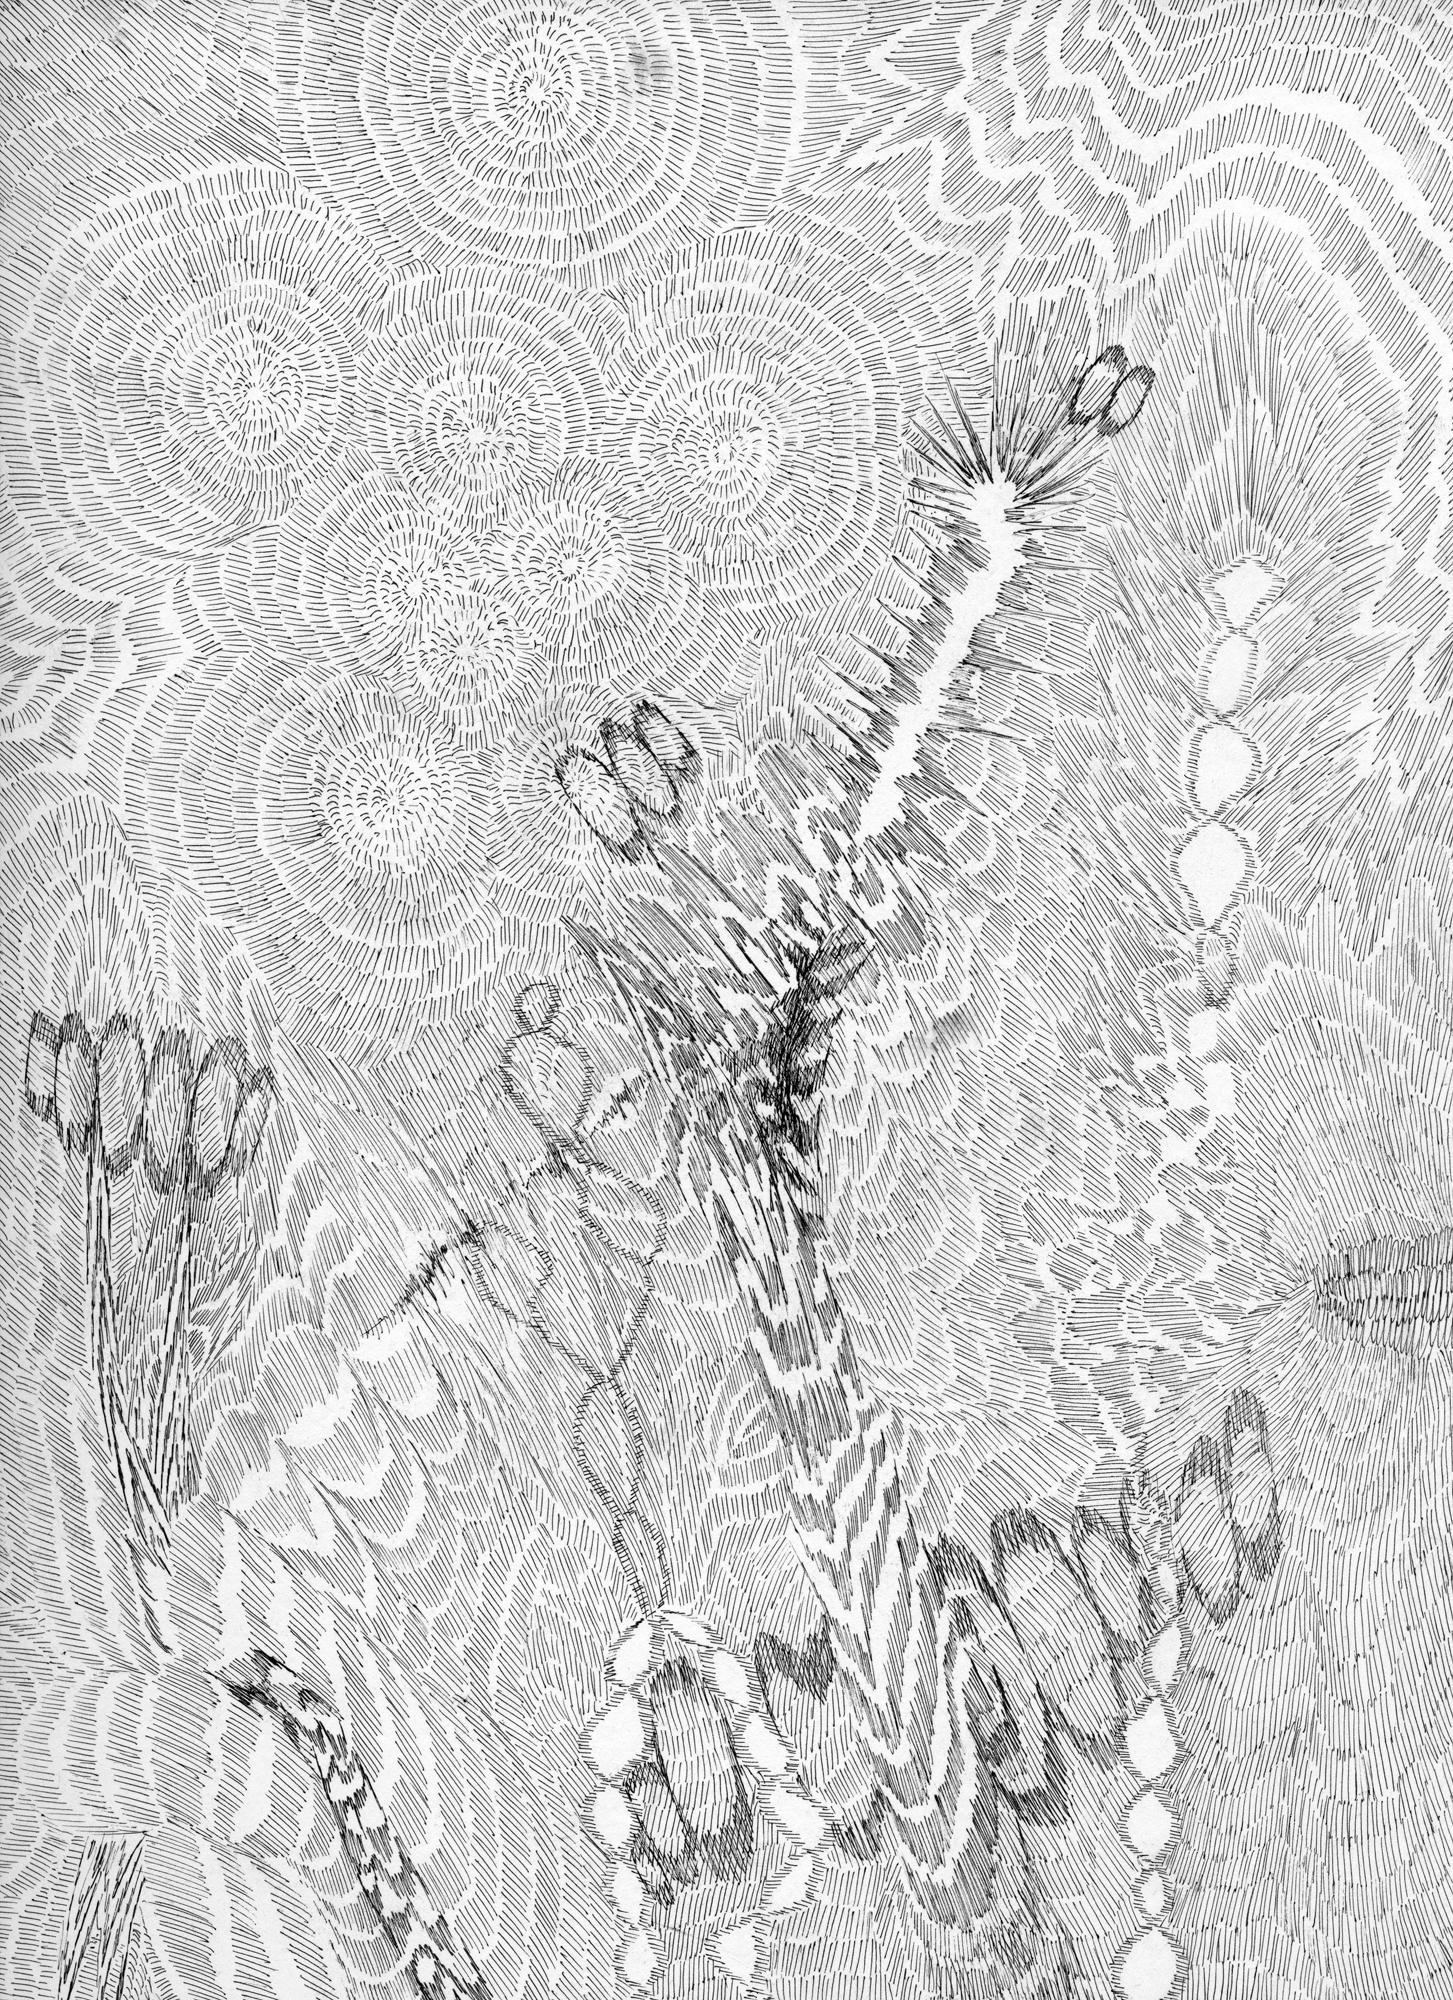 Untitled (Flux 05.05) , 2019 Ink on paper 30.4 cm x 22.8 cm